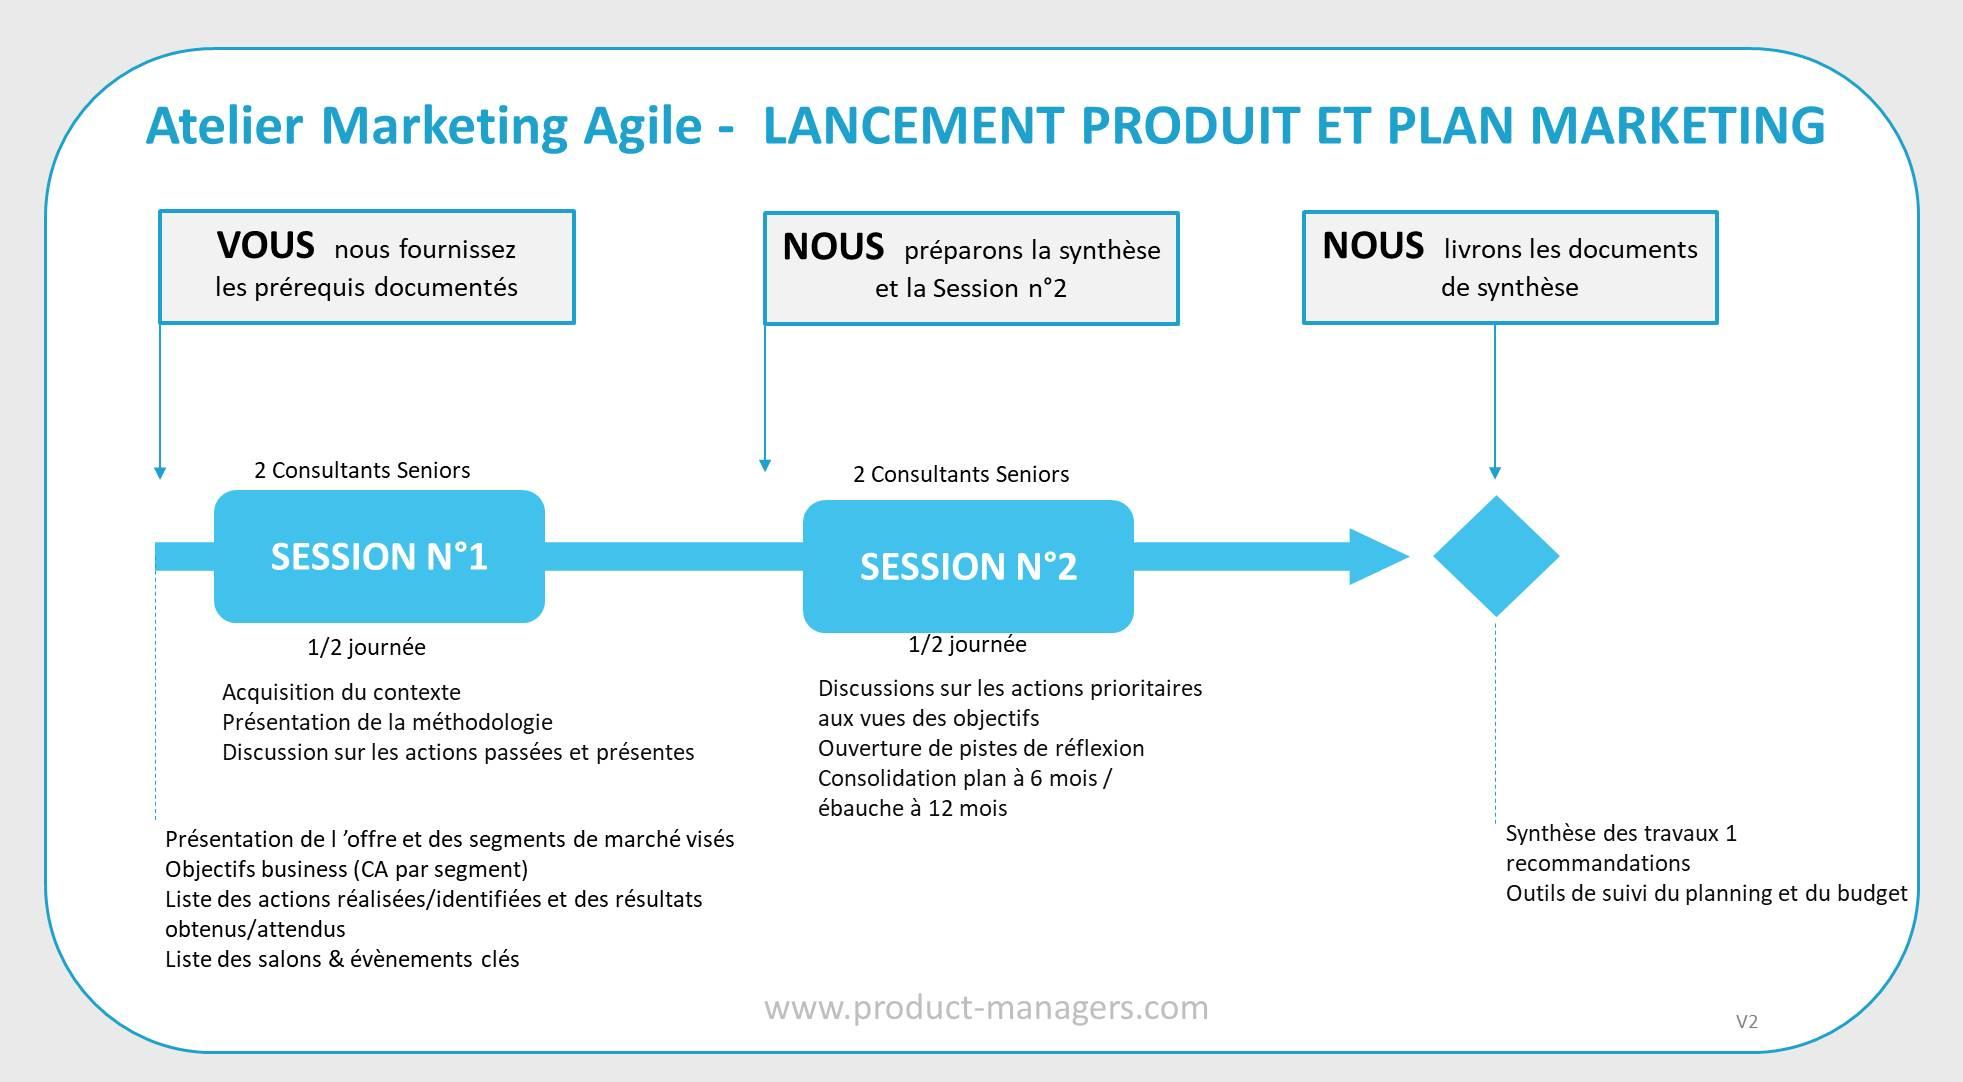 atelier-marketing-agile-lancement-produit-plan-marketing-v2